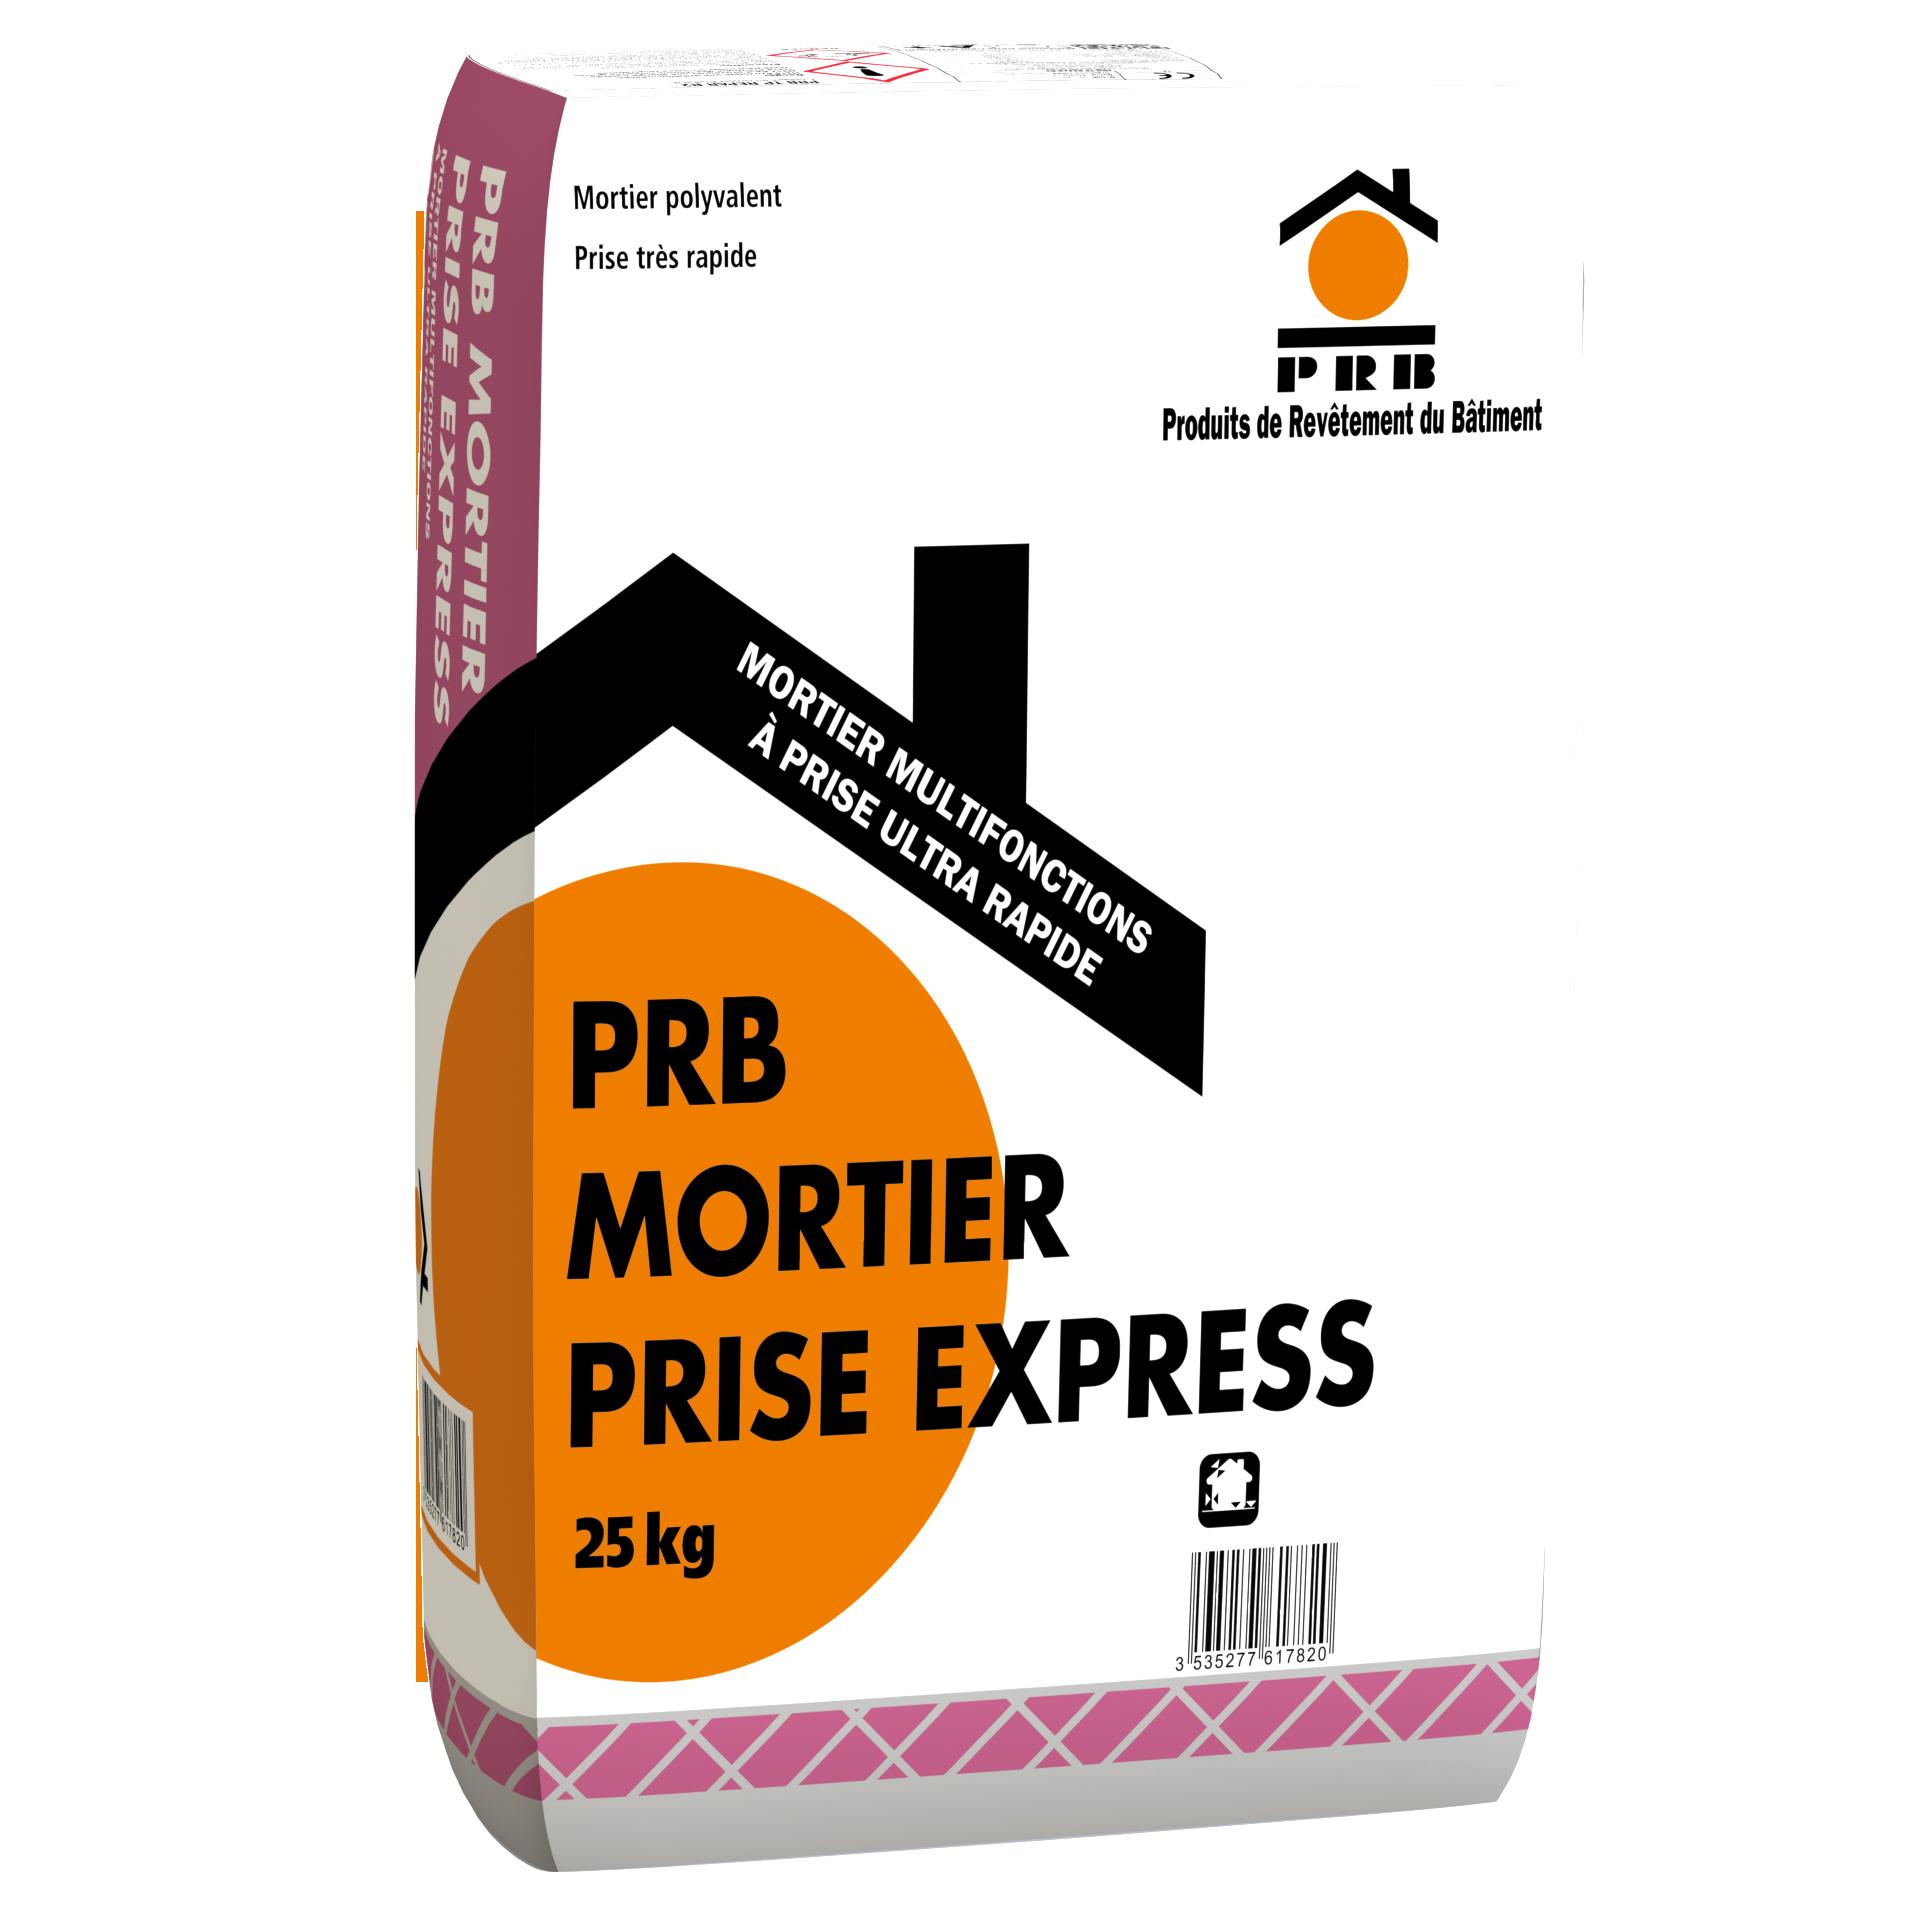 PRB MORTIER PRISE EXPRESS 25 KG